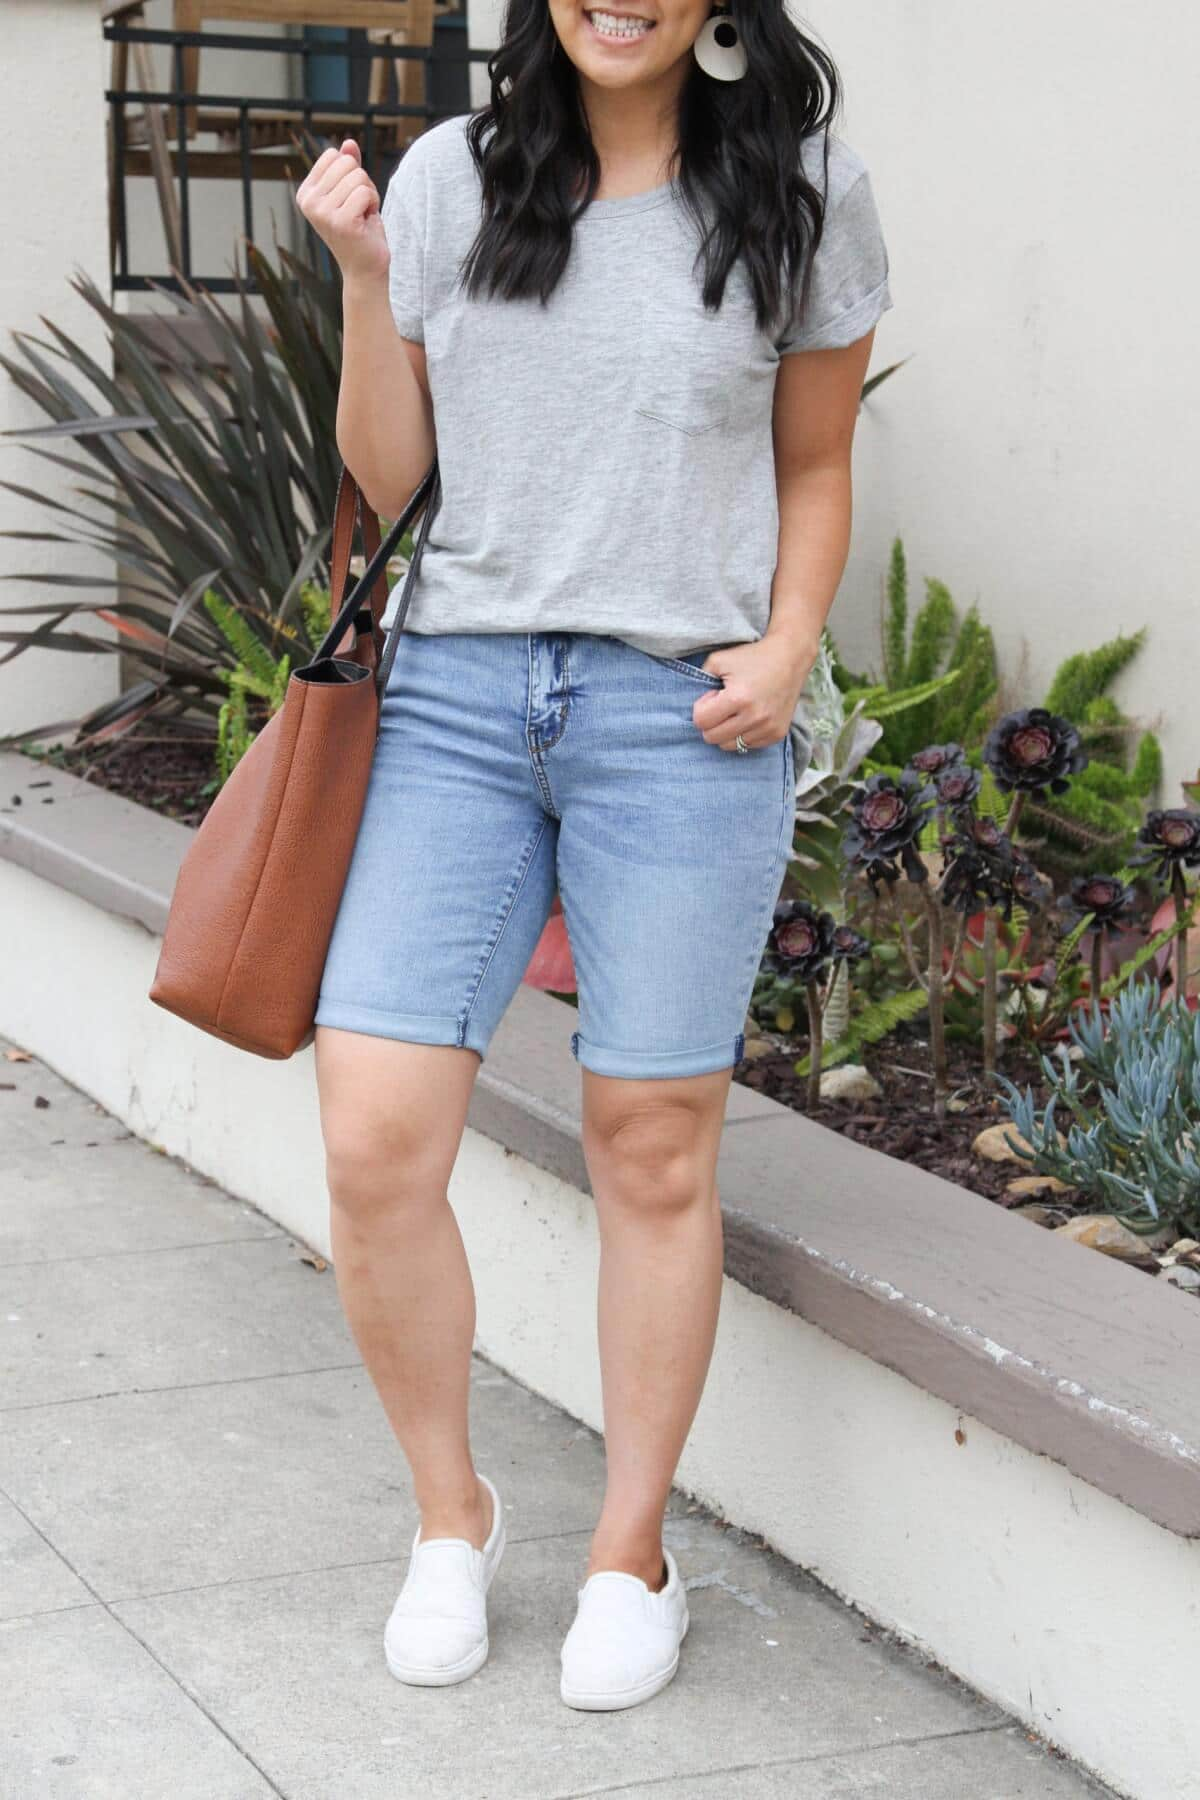 Casual Outfit: grey tee + denim bermuda shorts + white sneakers + white earrings + tan tote